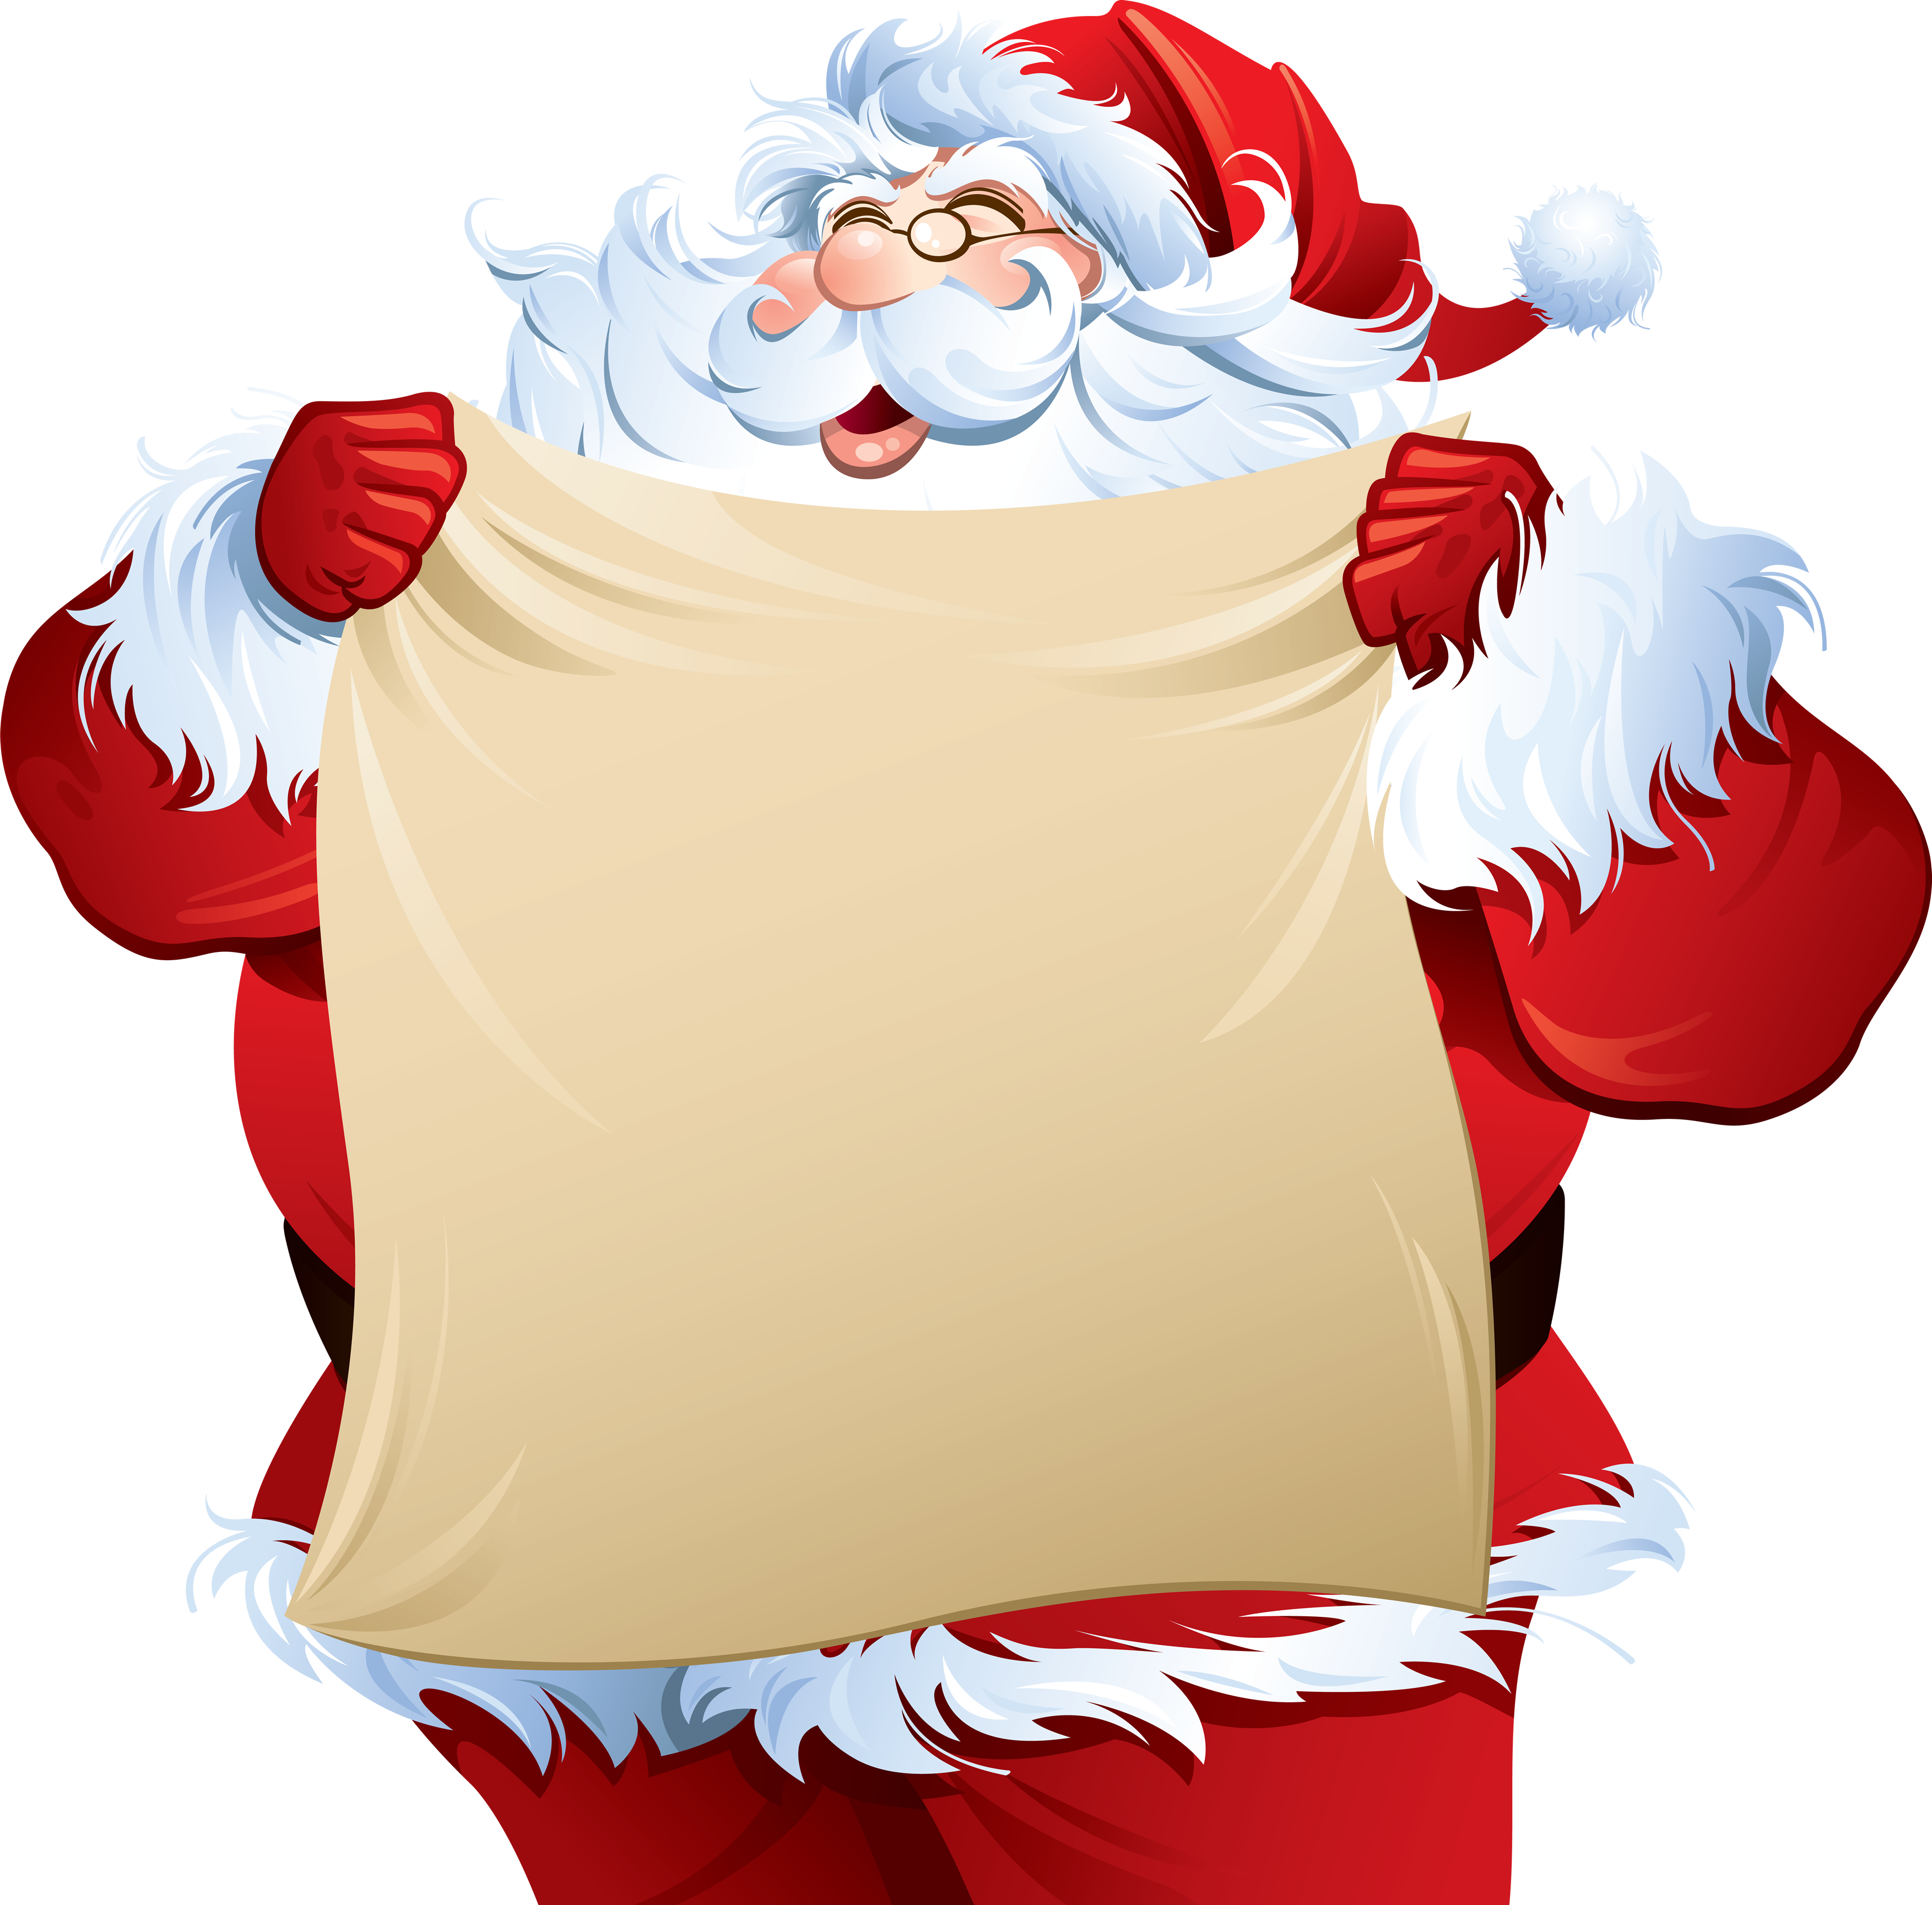 Santa money clipart jpg free download Santa Claus PNG images free download, Santa Claus PNG jpg free download